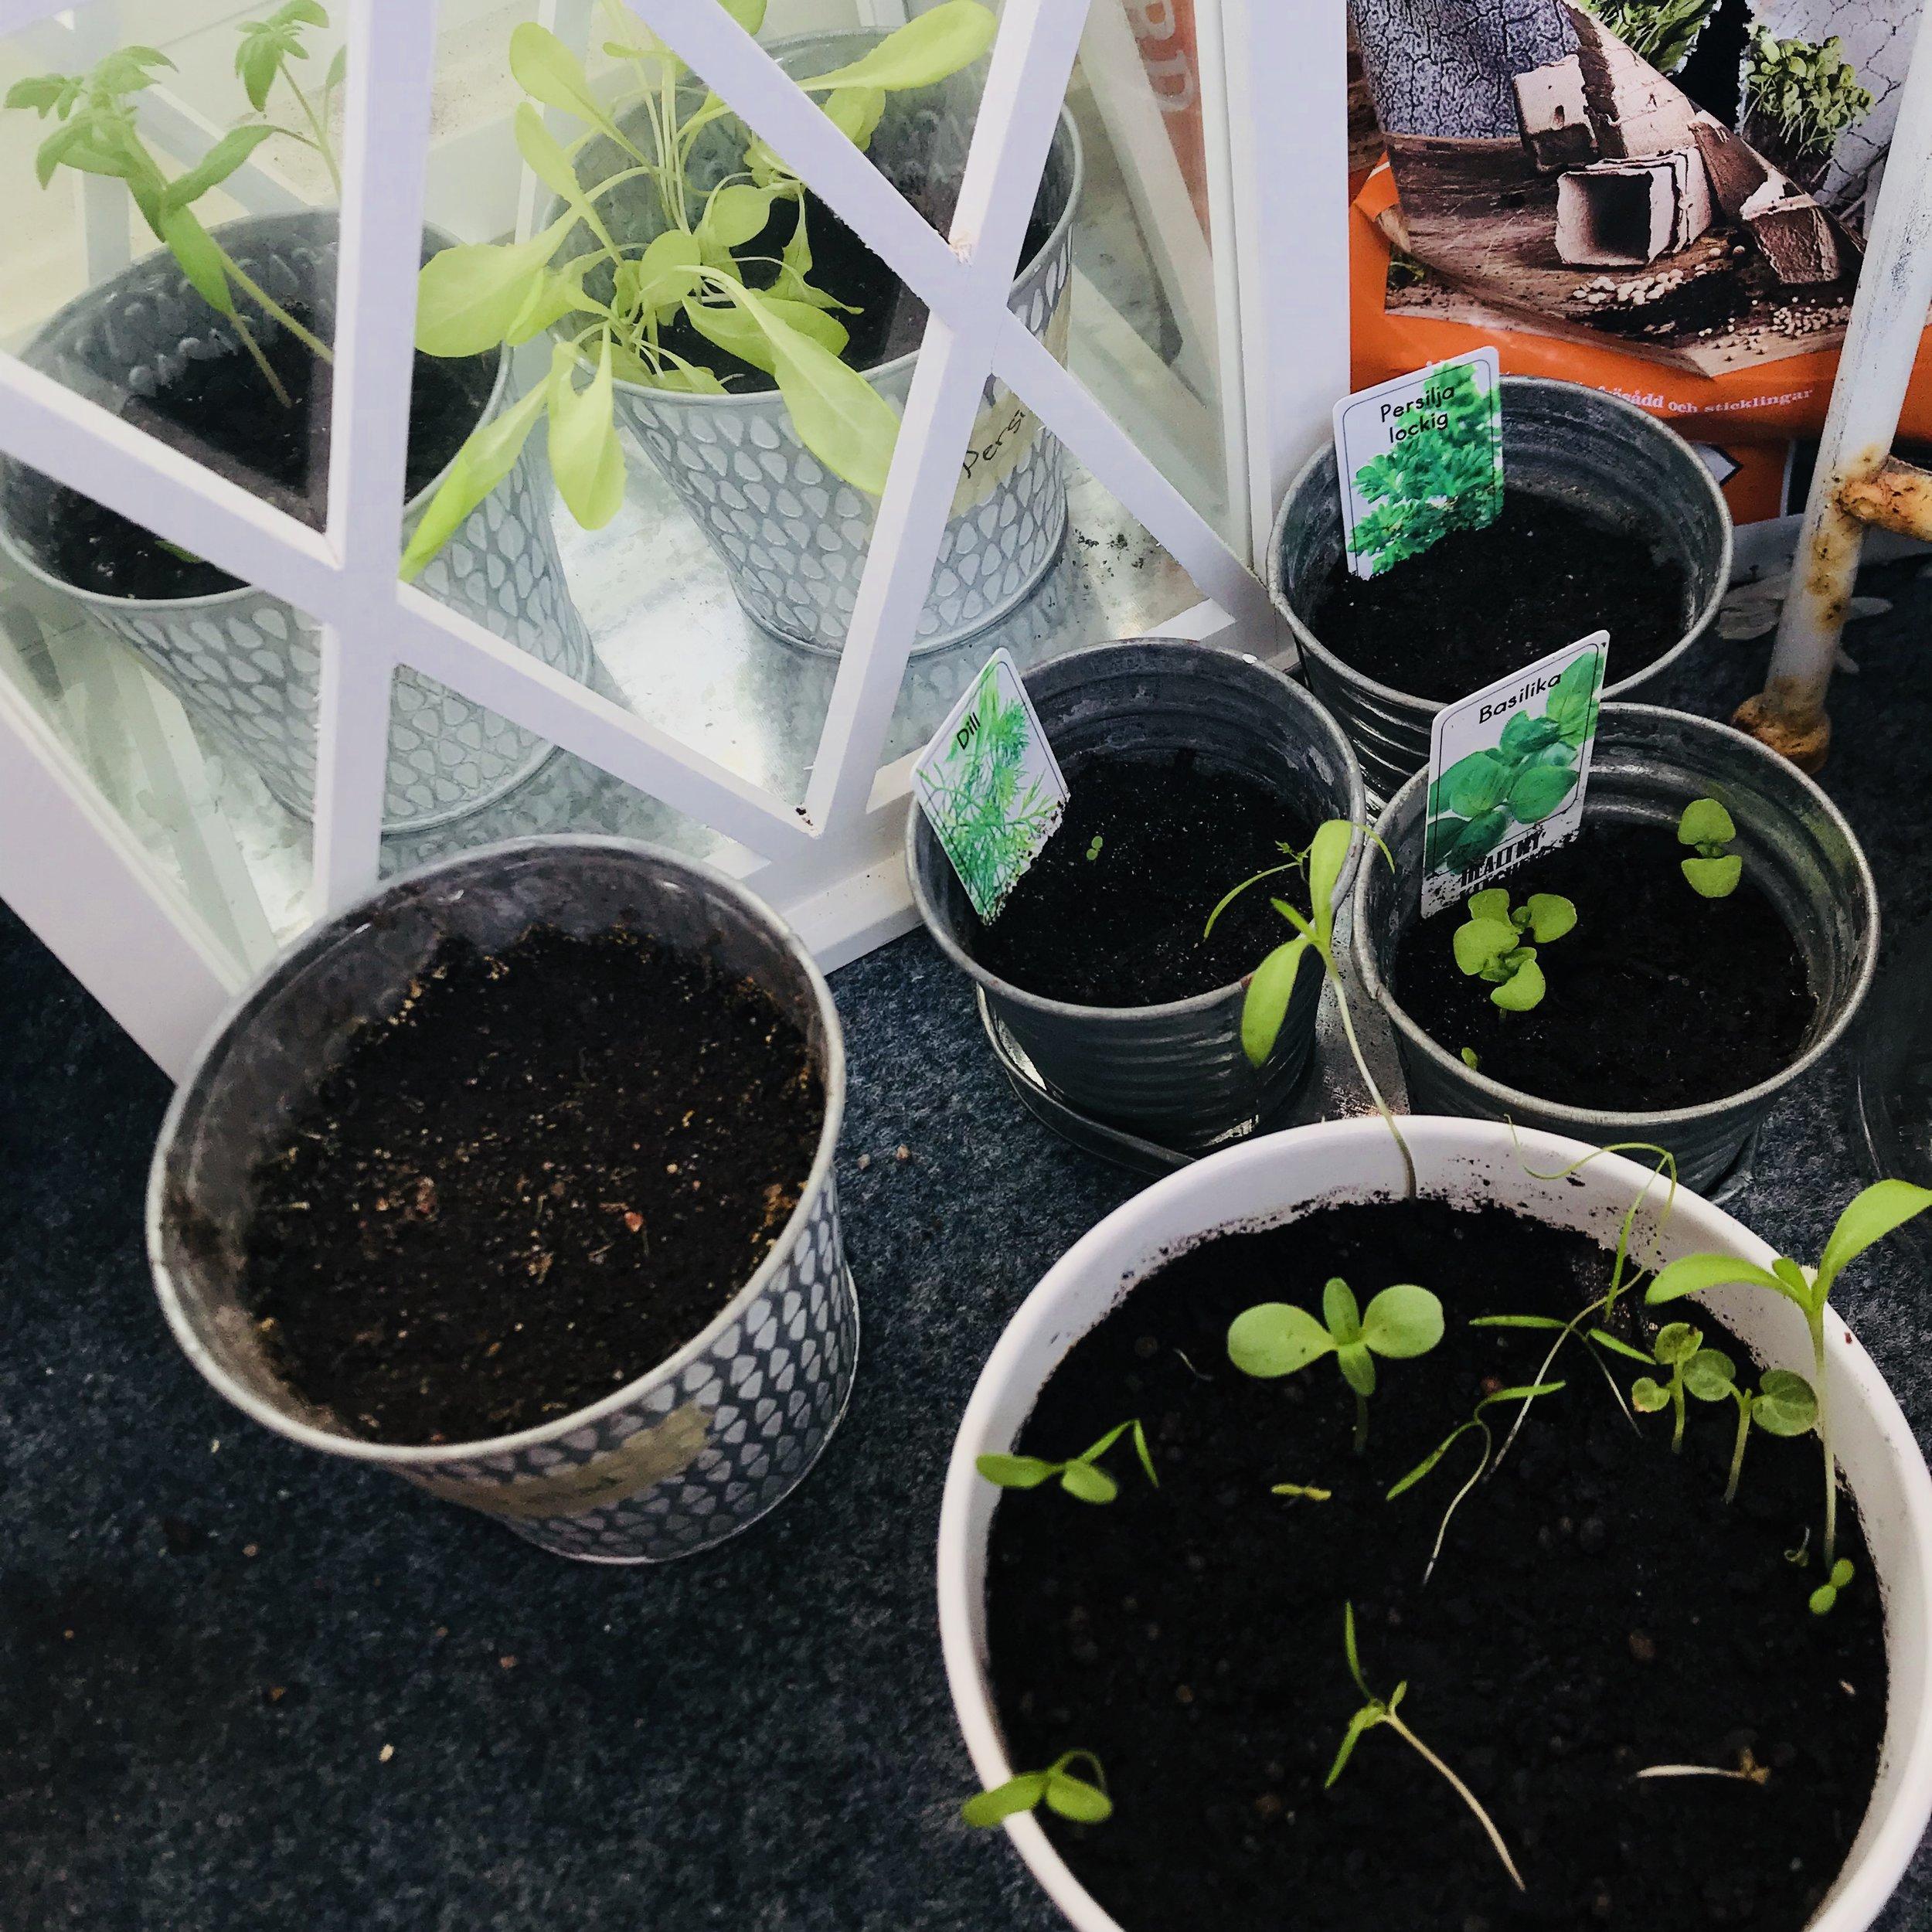 Persilja, basilika, tomat, spenat, dill och citronmeliss! 🌱